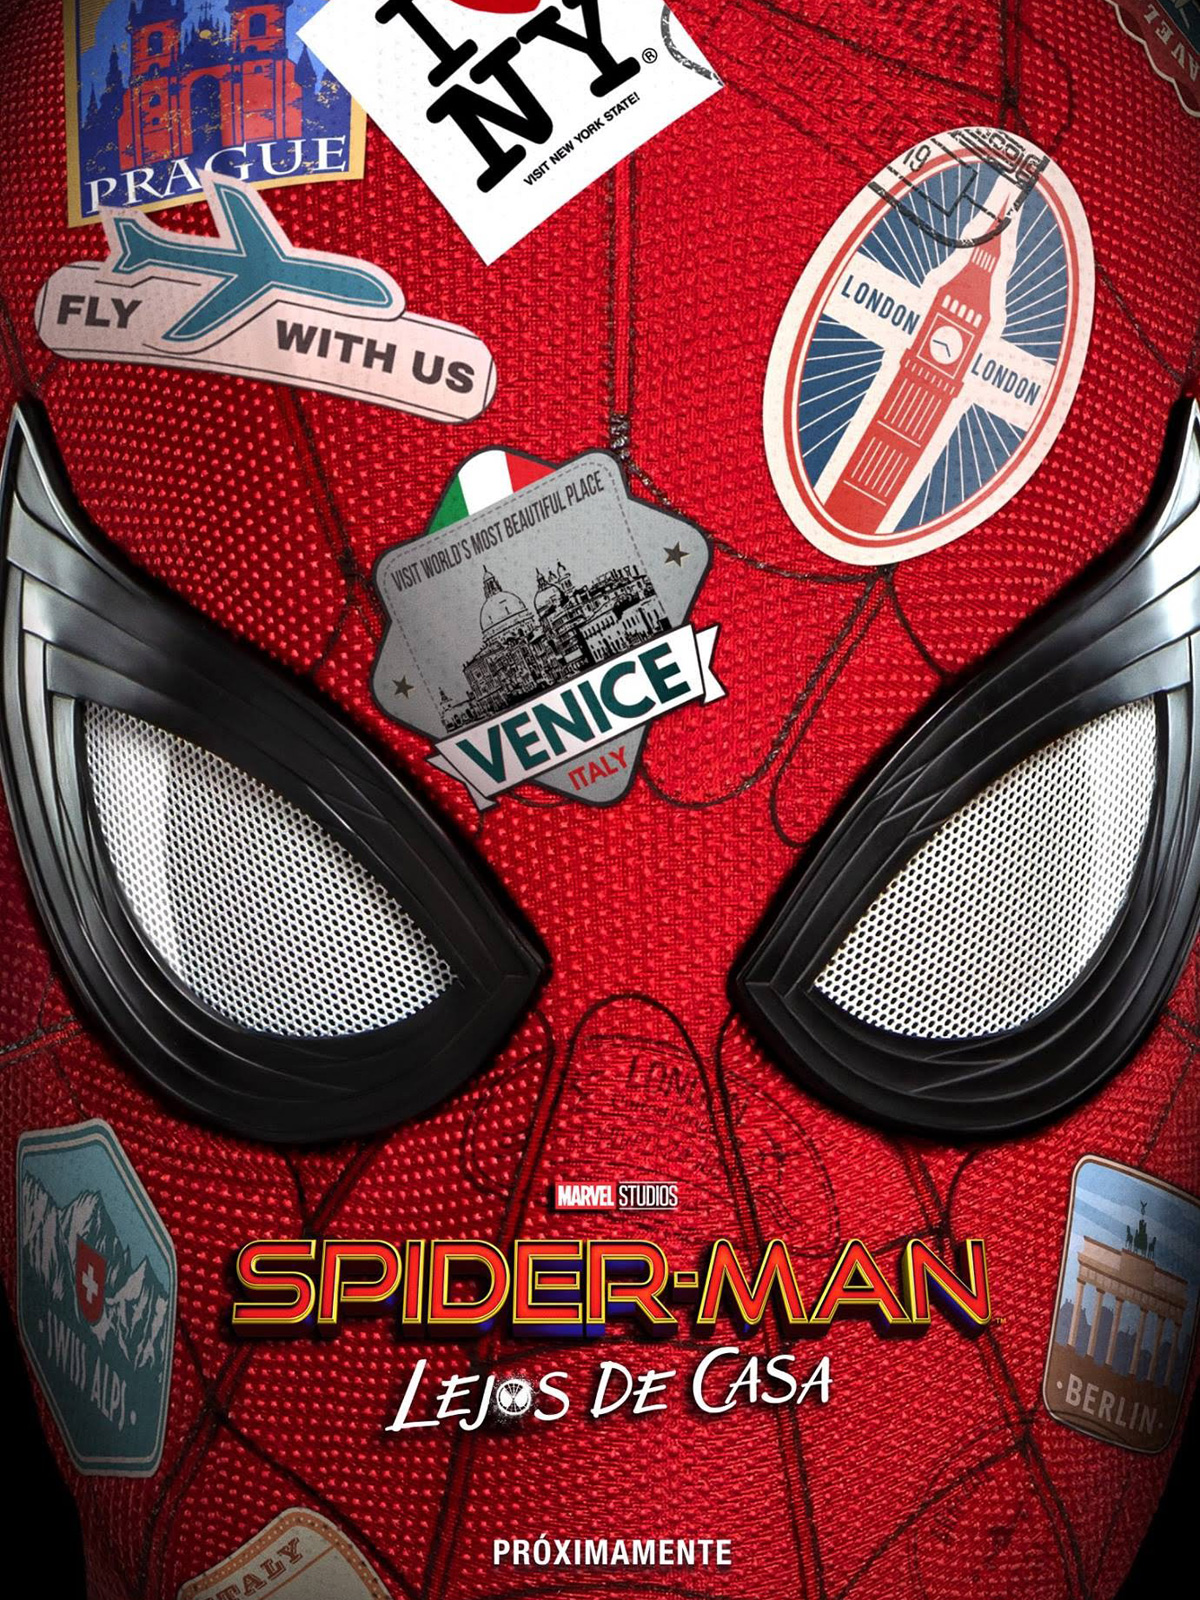 Spider-Man Lejos de casa - teaser poster.jpg